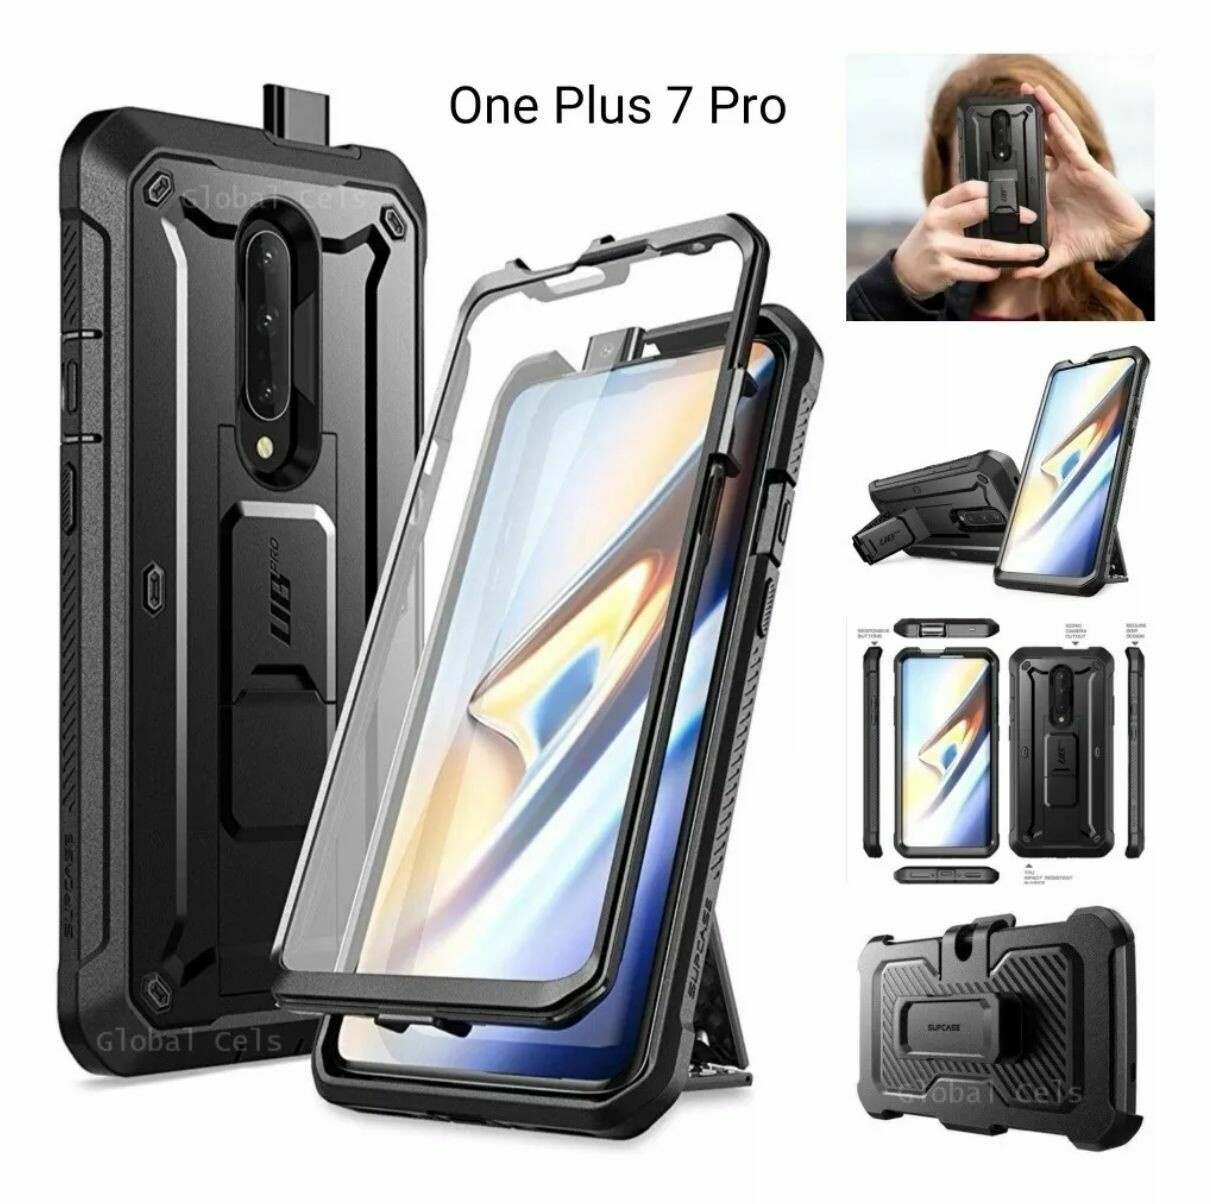 Case Funda OnePlus 7 Pro Protector 360° c/ Parador c/ Gancho